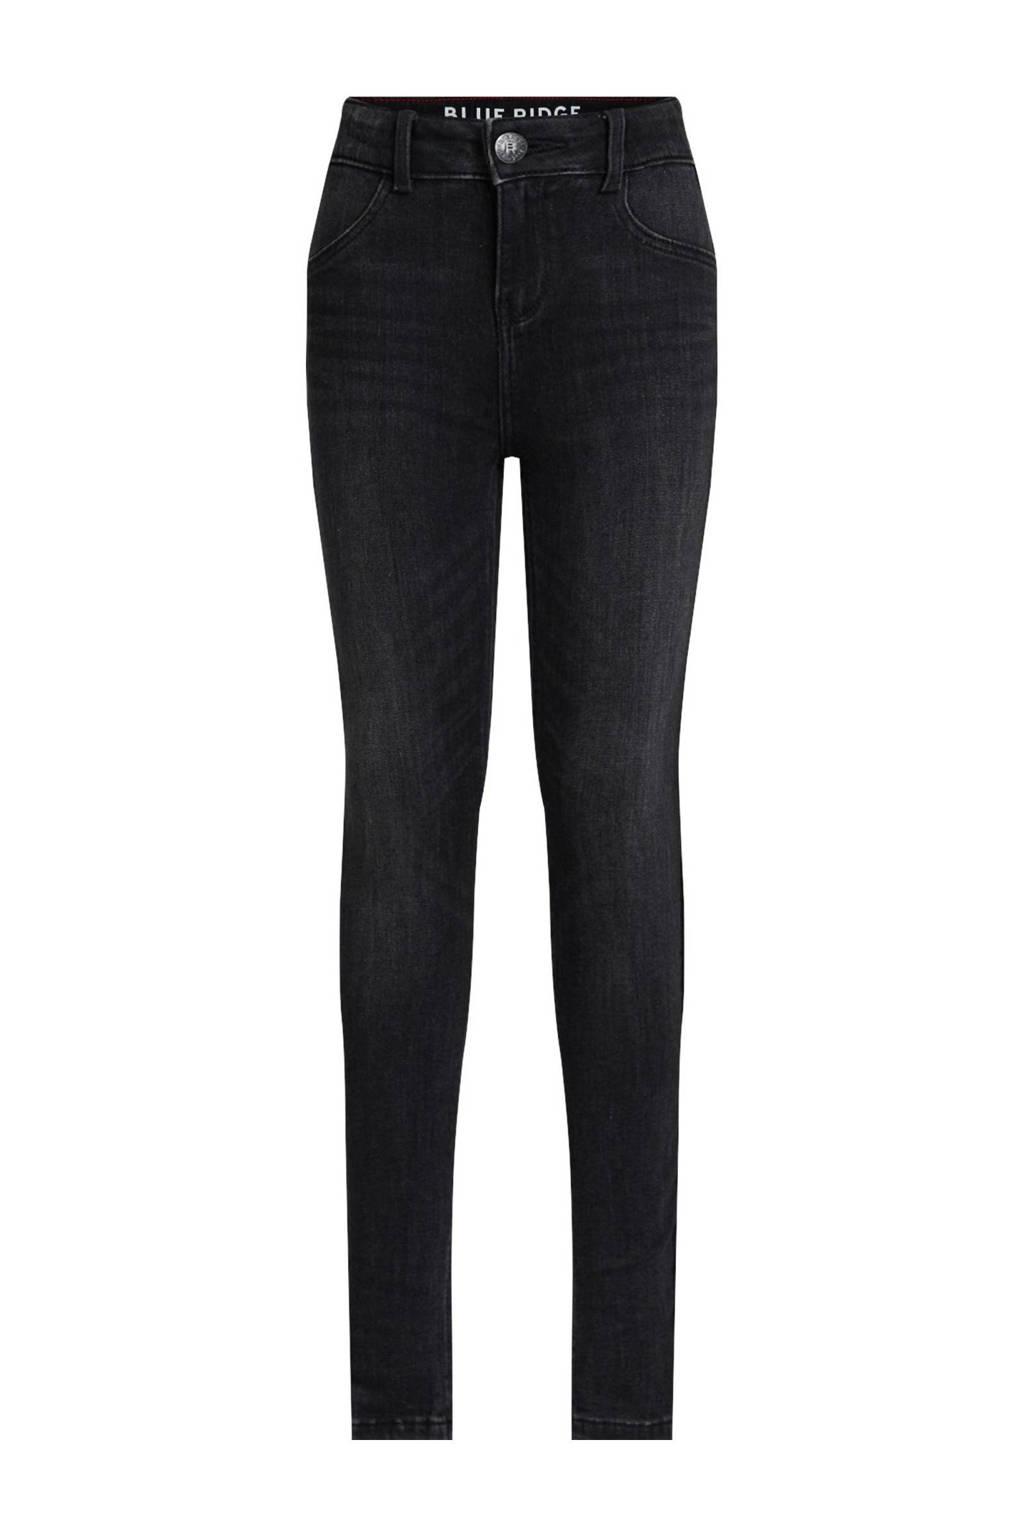 WE Fashion Blue Ridge super skinny jeans Yfke antraciet, Antraciet